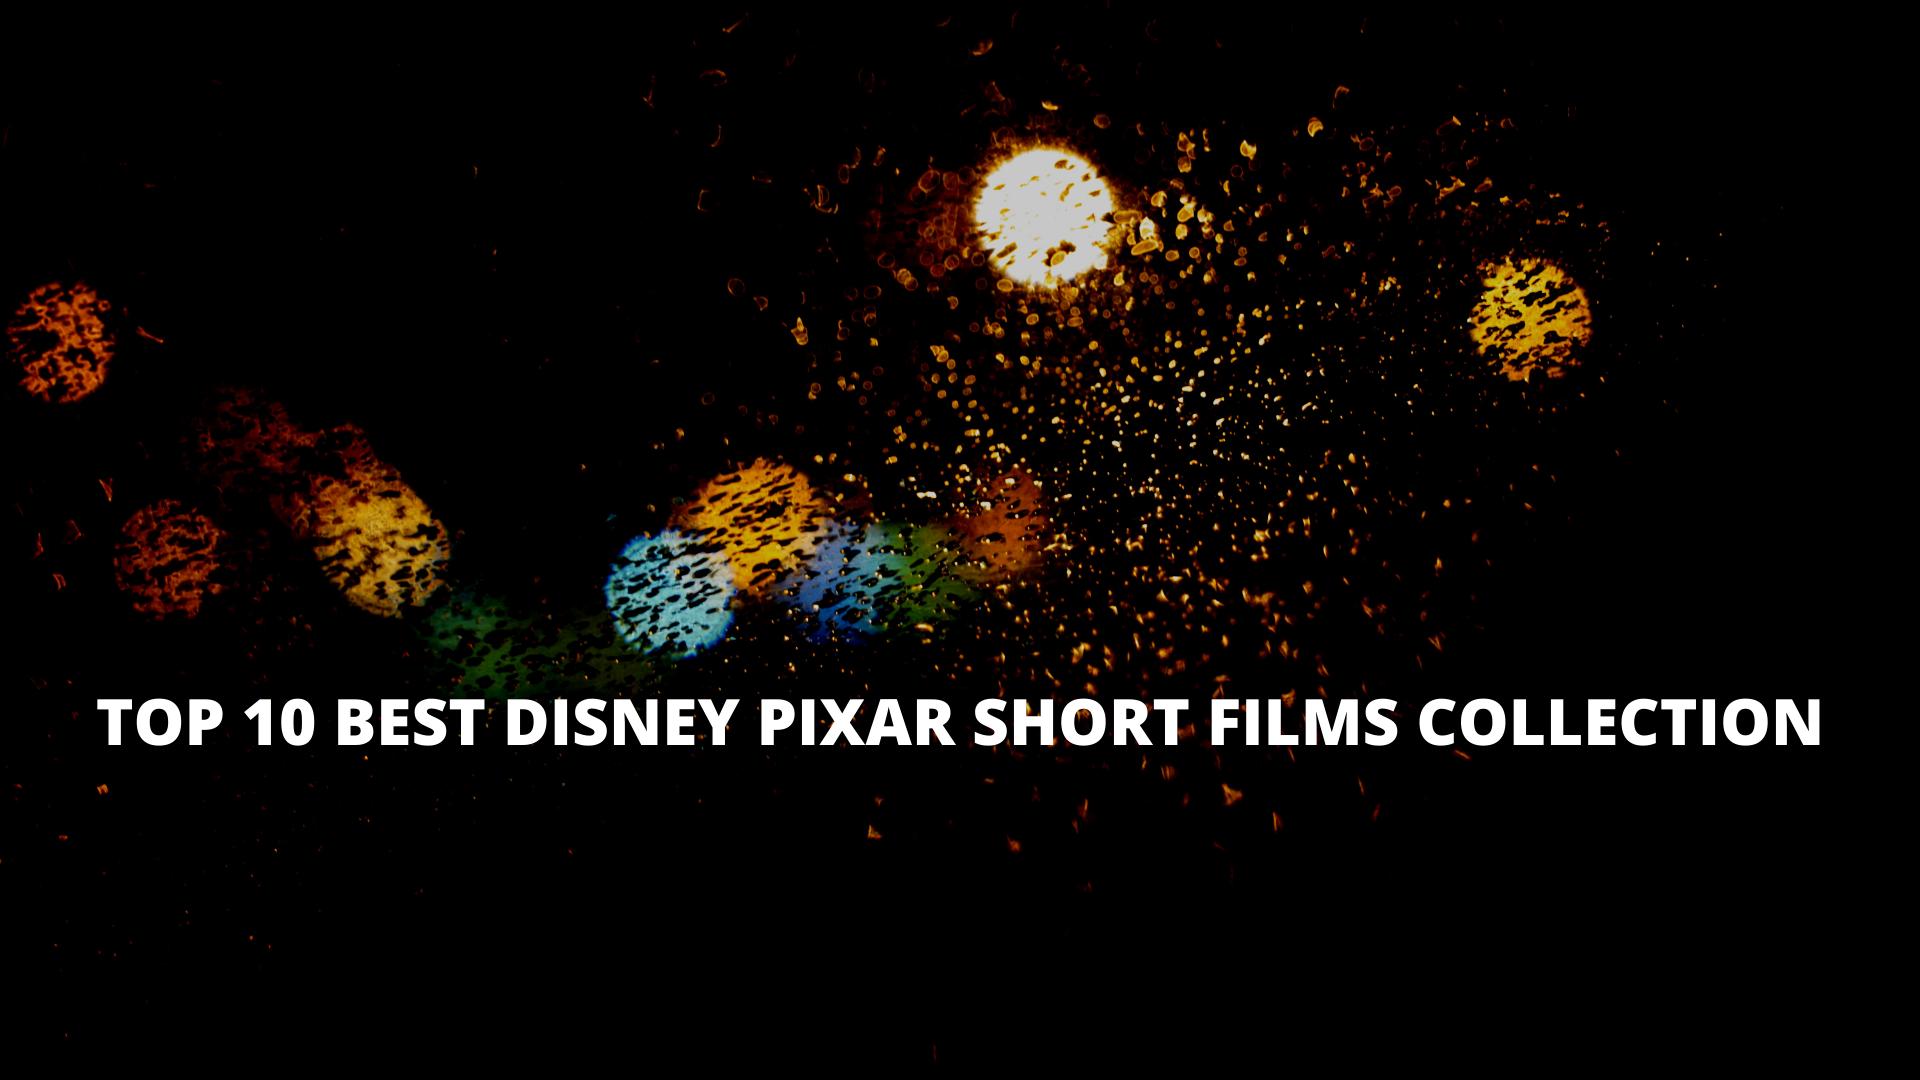 Top 10 Best Disney Pixar short films collection